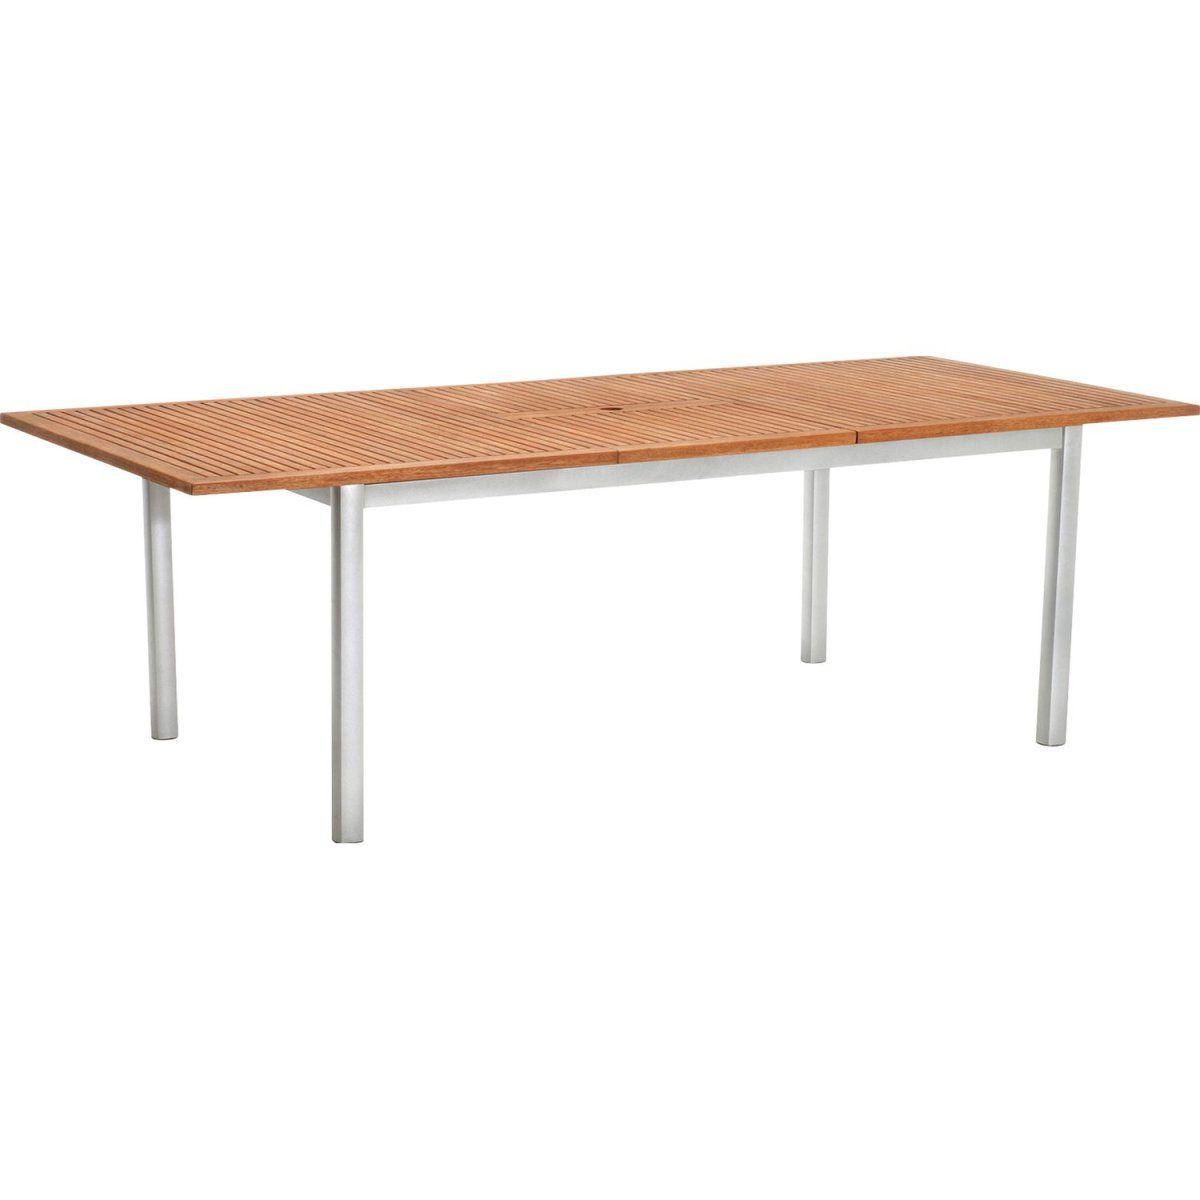 OBI Holz-Gartentisch Harris 180/240 cm x 100 cm Ausziehbar Silber ...